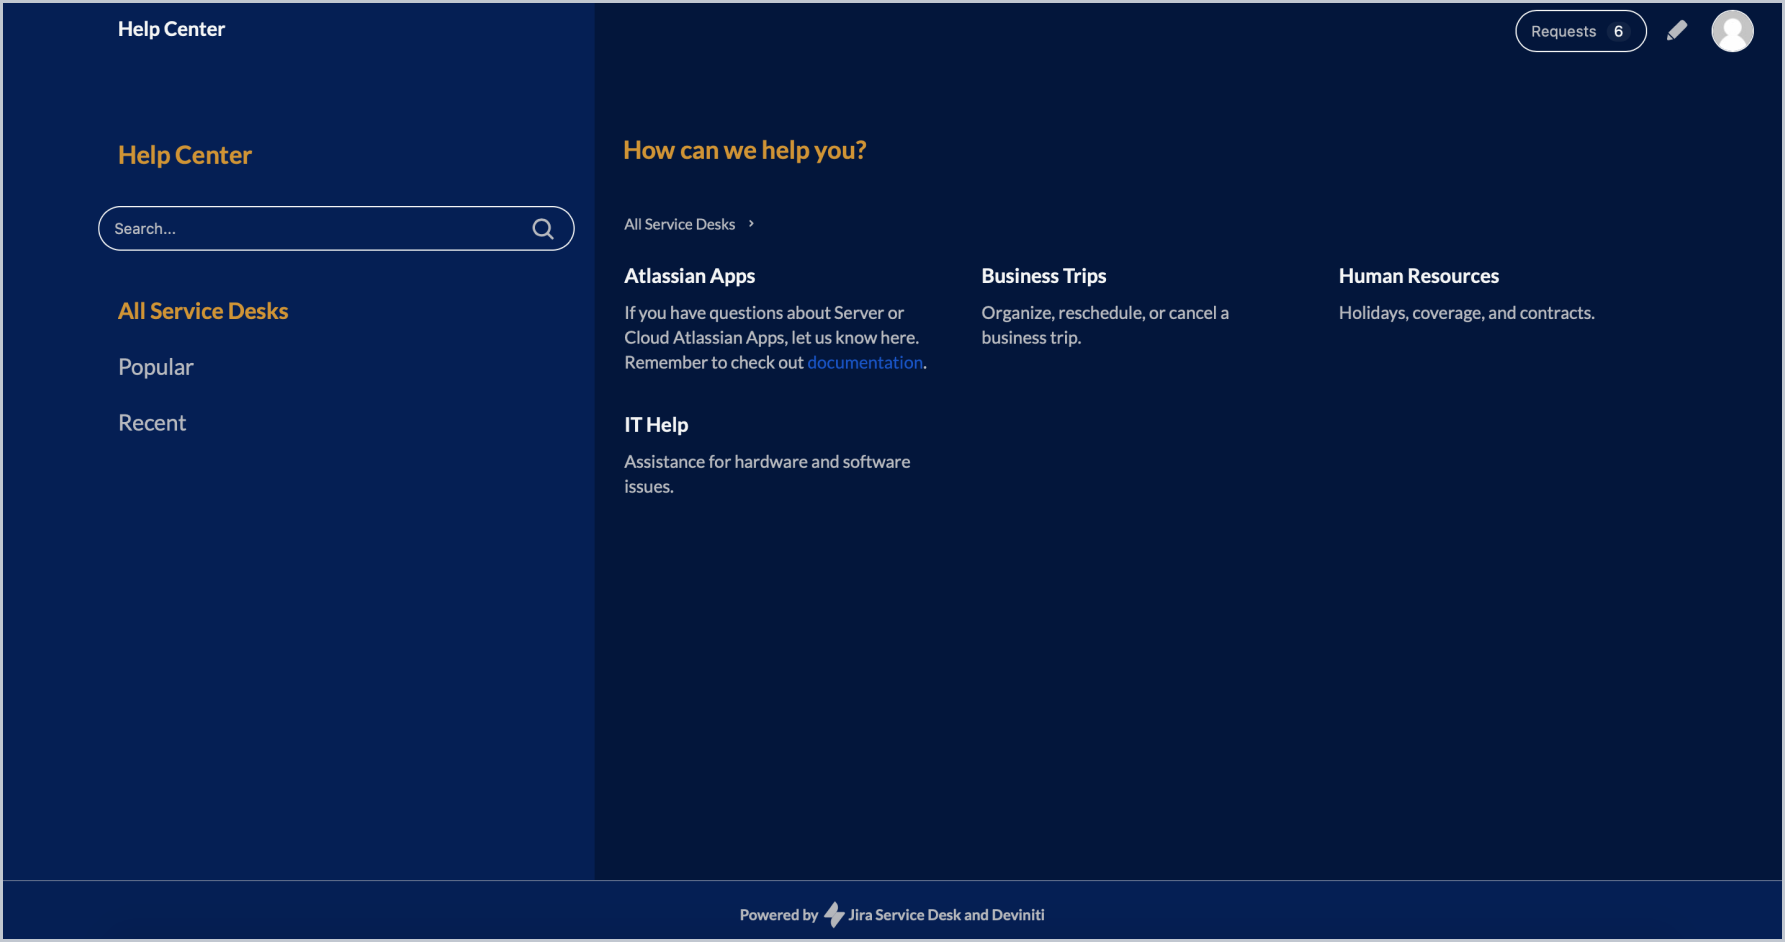 Portal Descriptions in a List Help Center